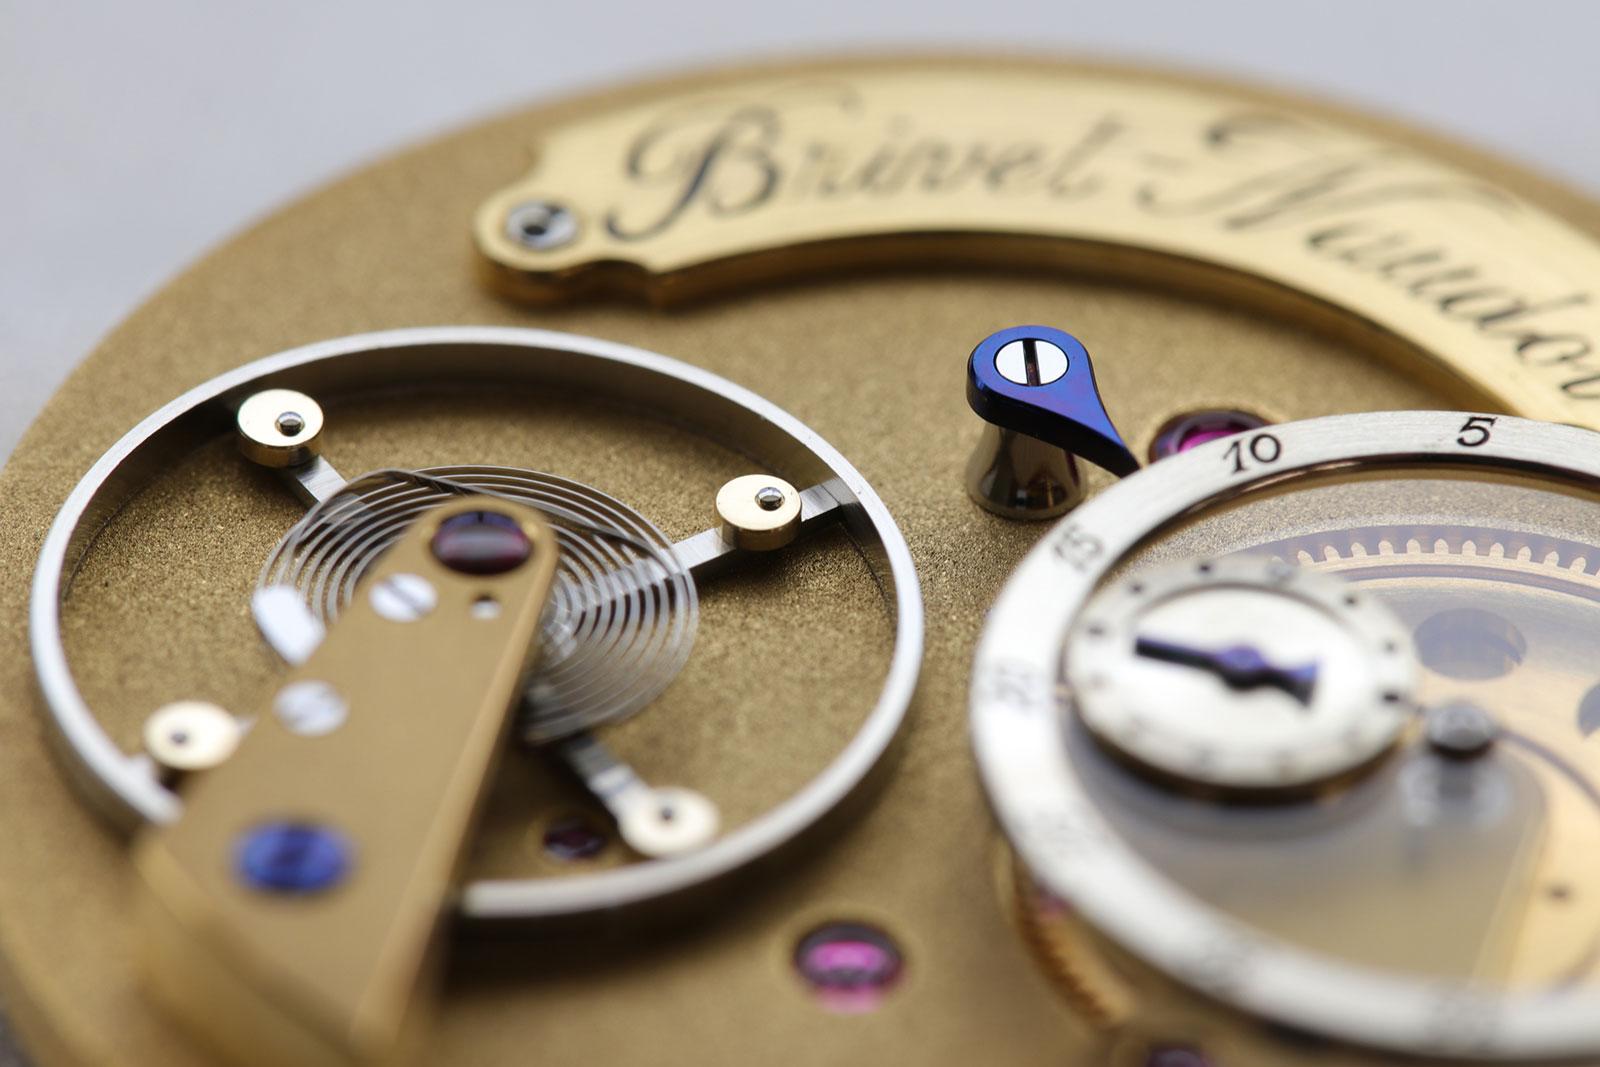 Brivet-Naudot wristwatch 9